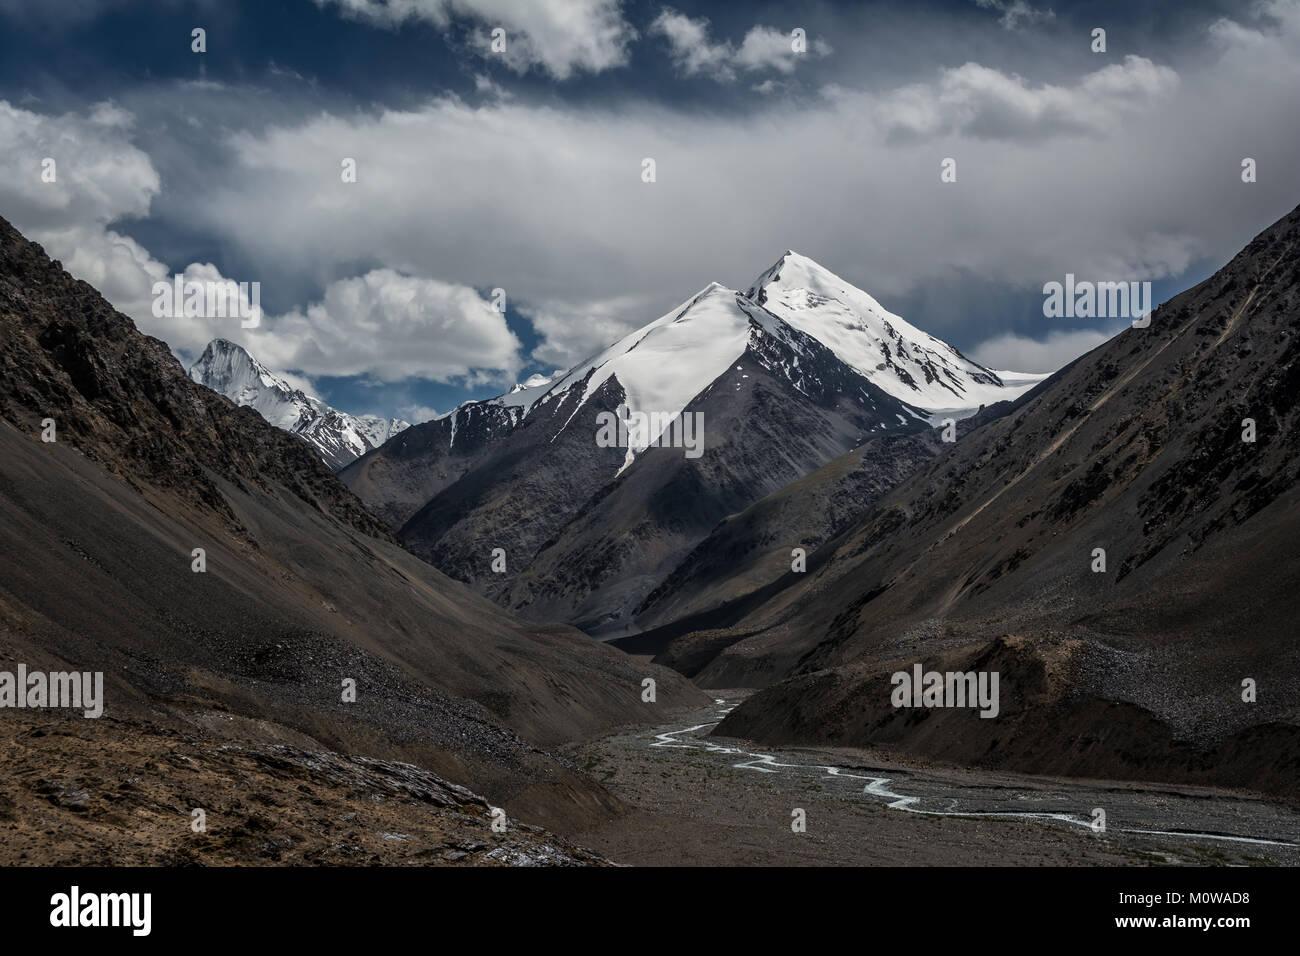 Chapchingal Sar I (Altitude: 6483 meters), Pakistan. The peak in the Karakoram range with a beautiful shape, stands - Stock Image